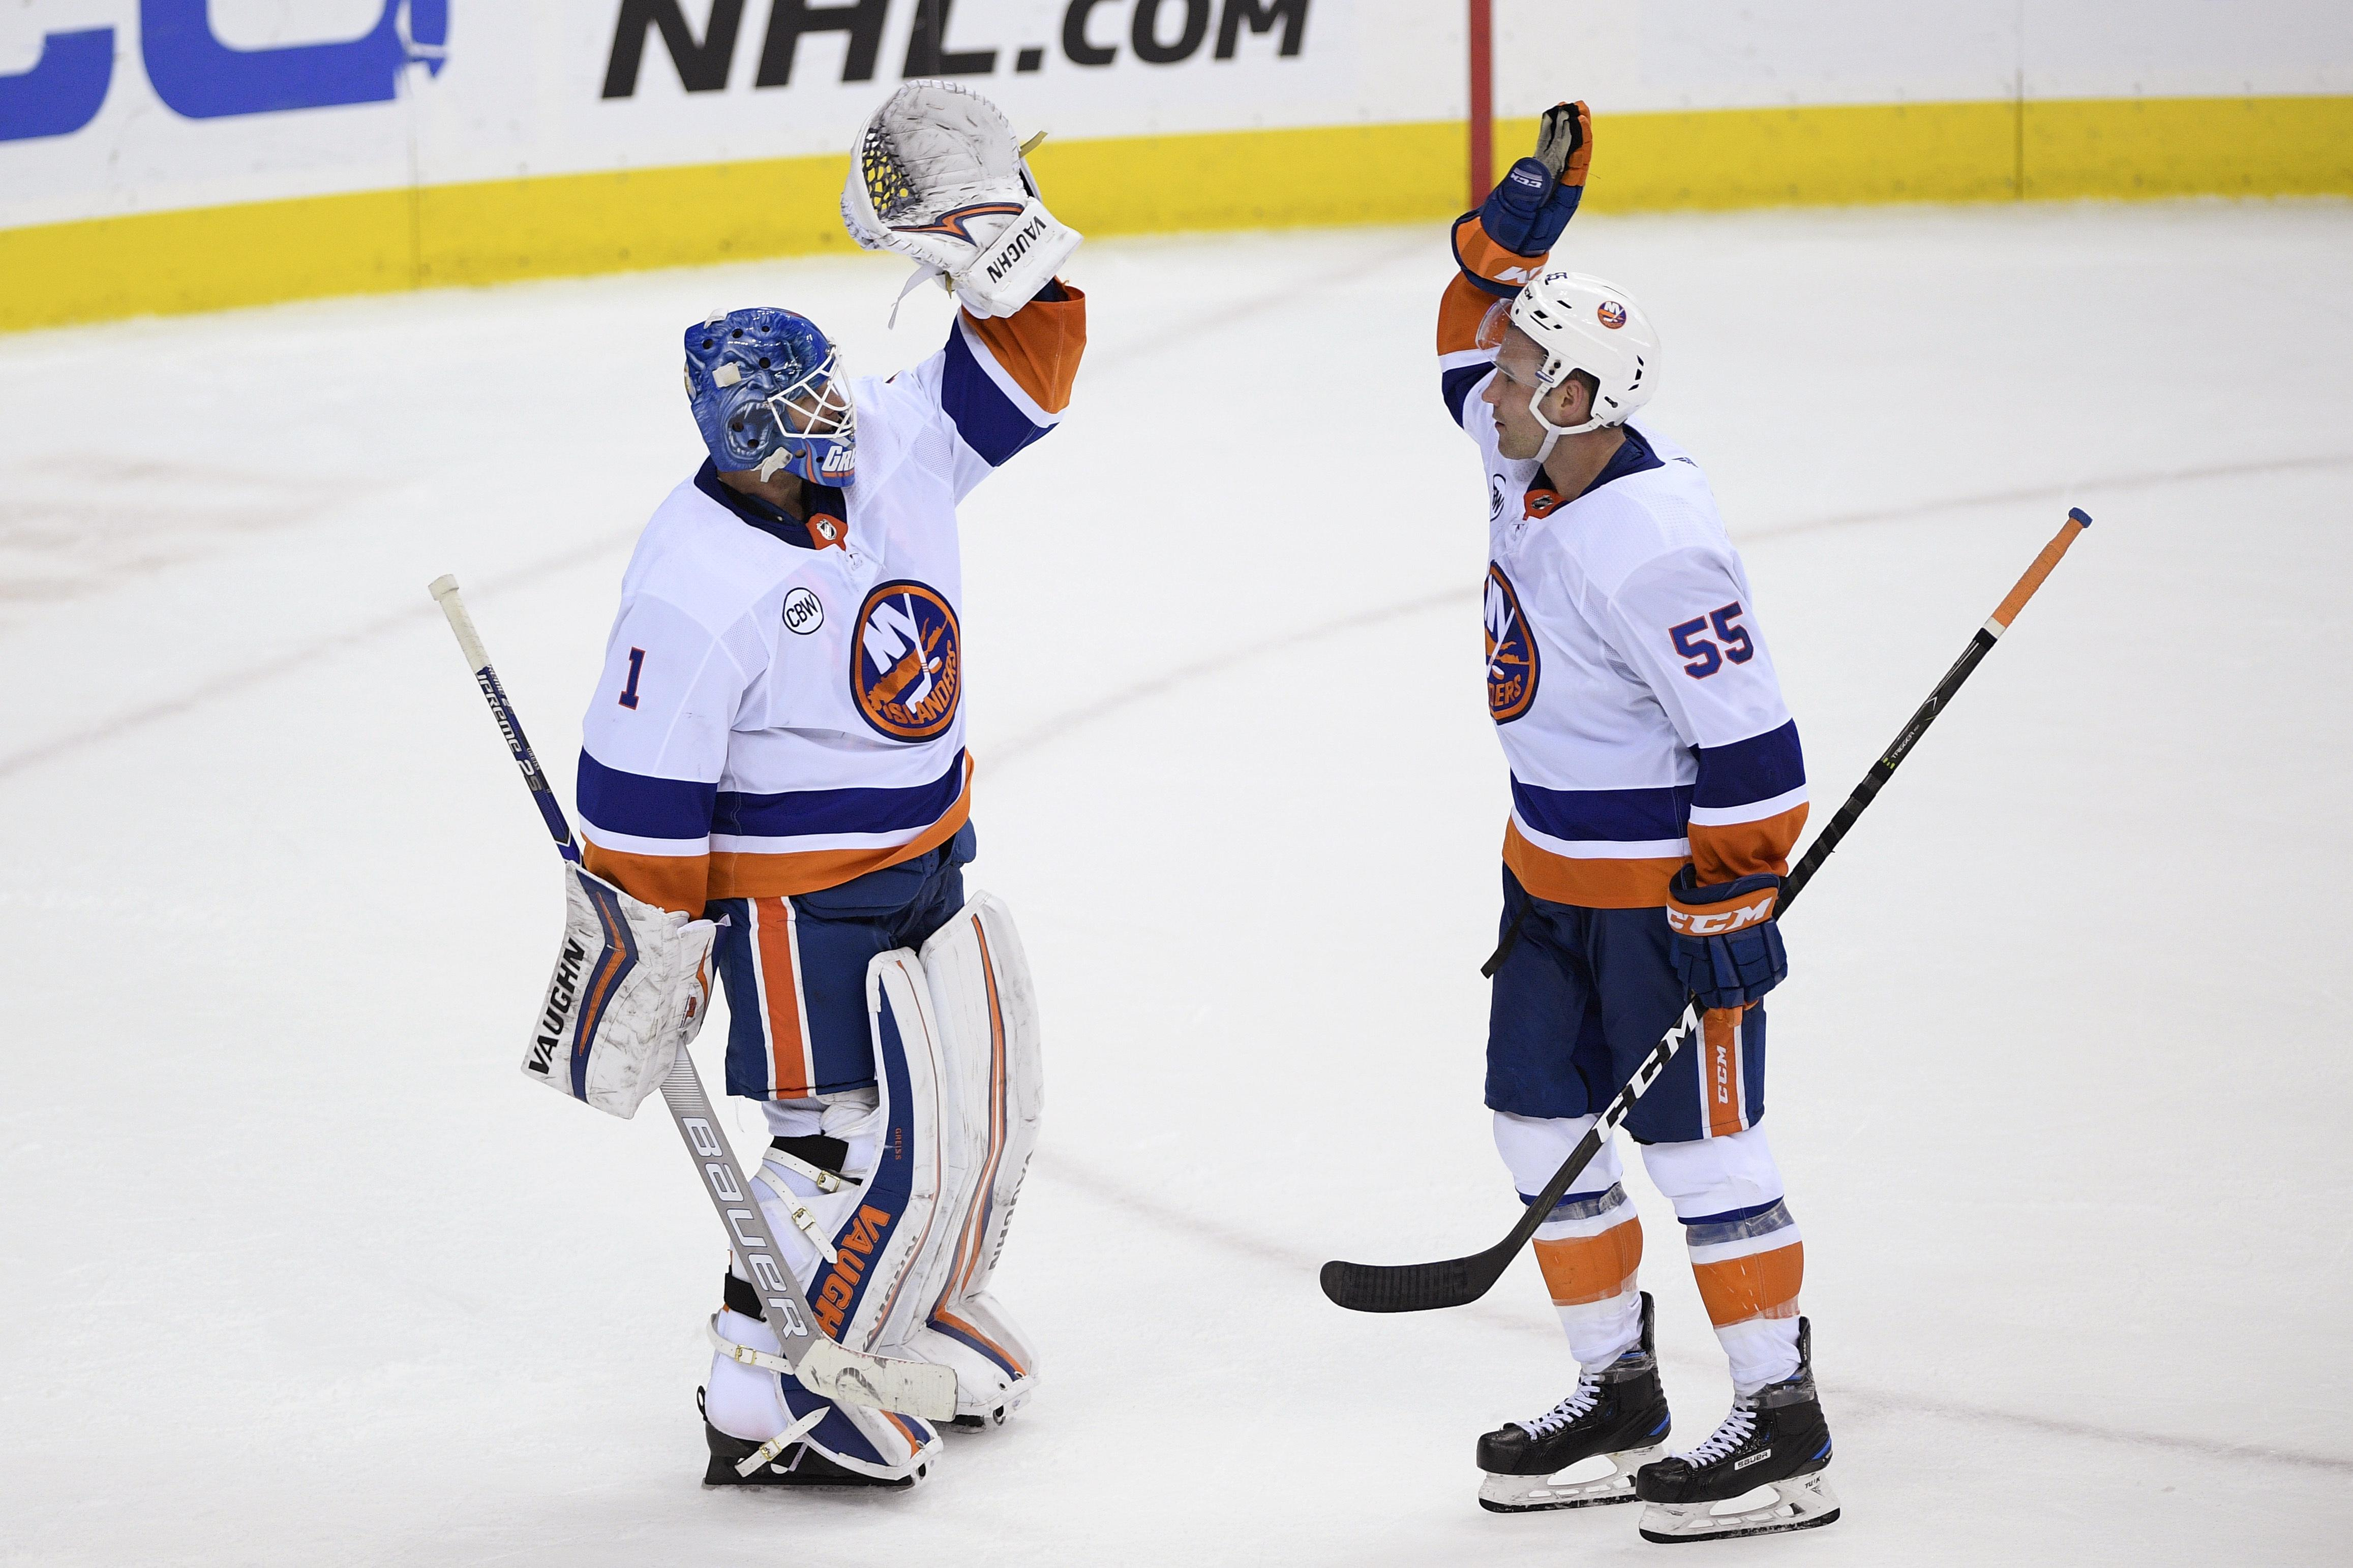 c9faabf5f3a New York Islanders goaltender Thomas Greiss (1) celebrates with defenseman  Johnny Boychuk (55